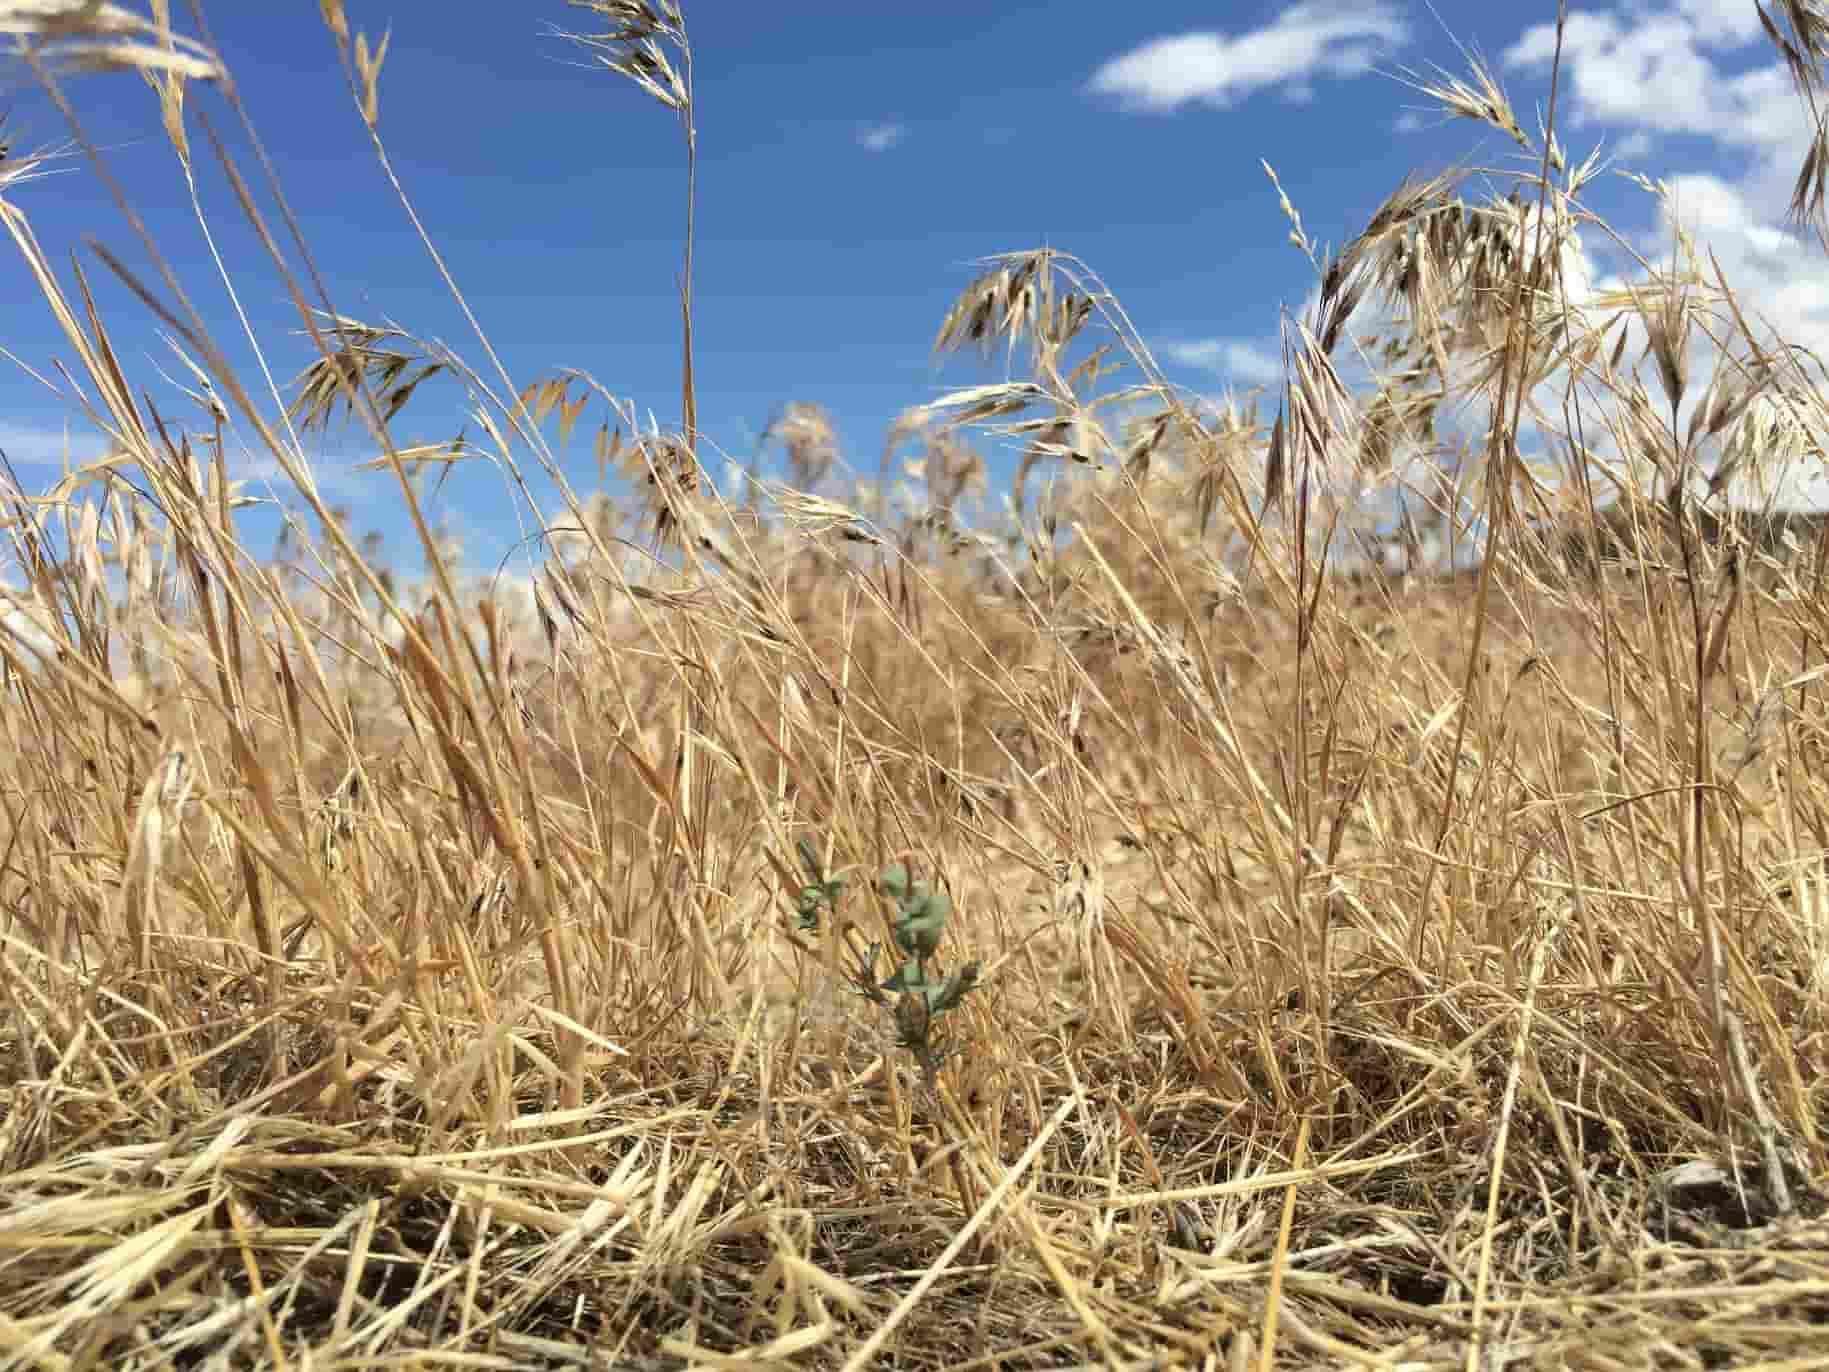 Field of cheatgrass